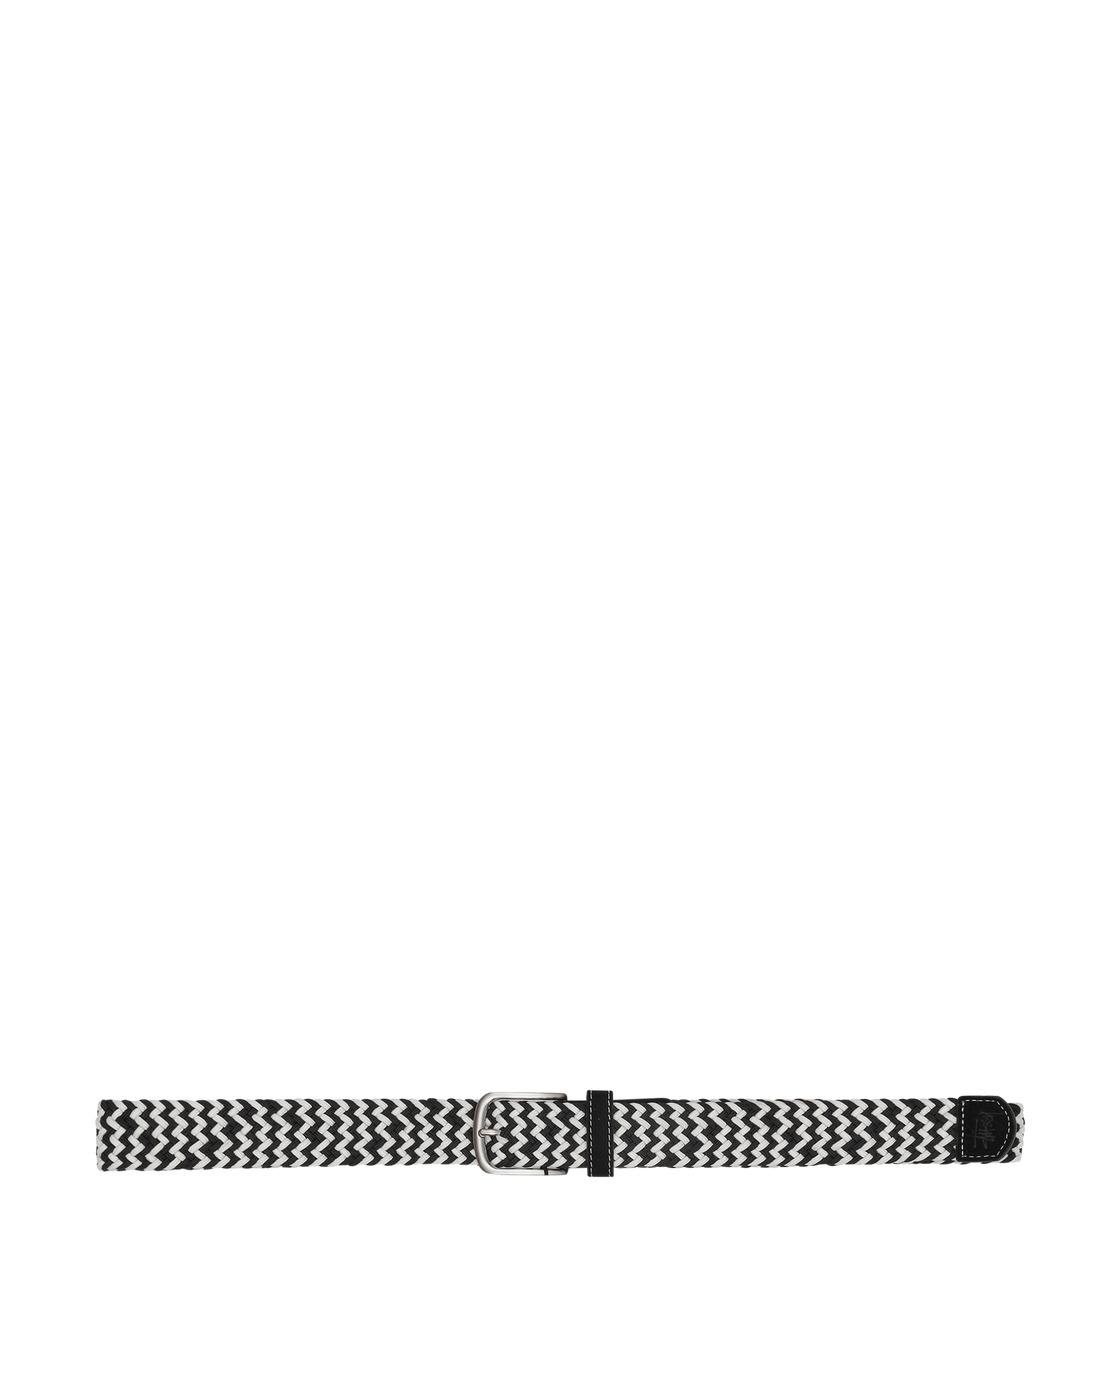 Photo: Stussy Woven Cord Belt Black